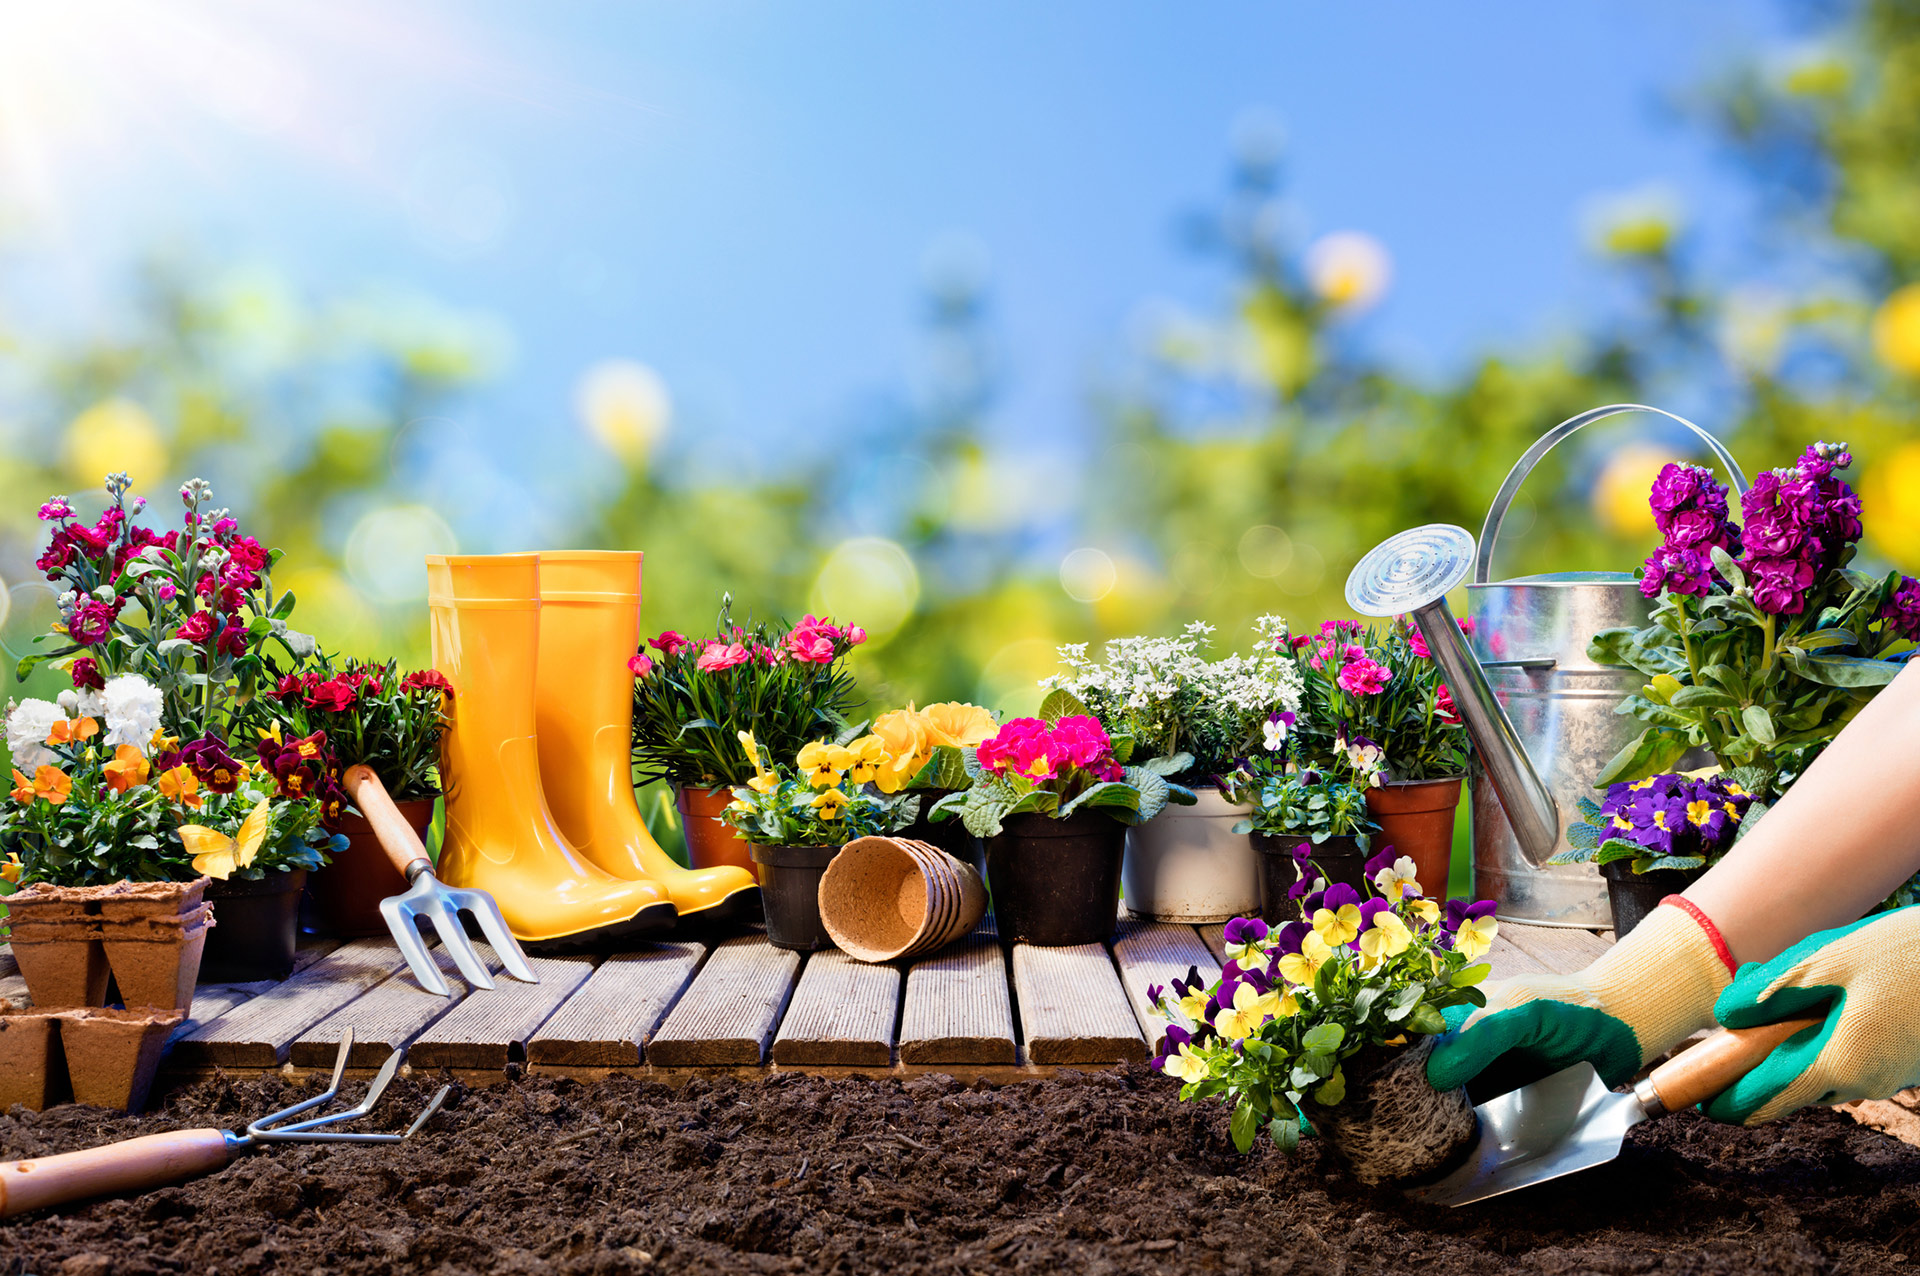 gardening tools flowers